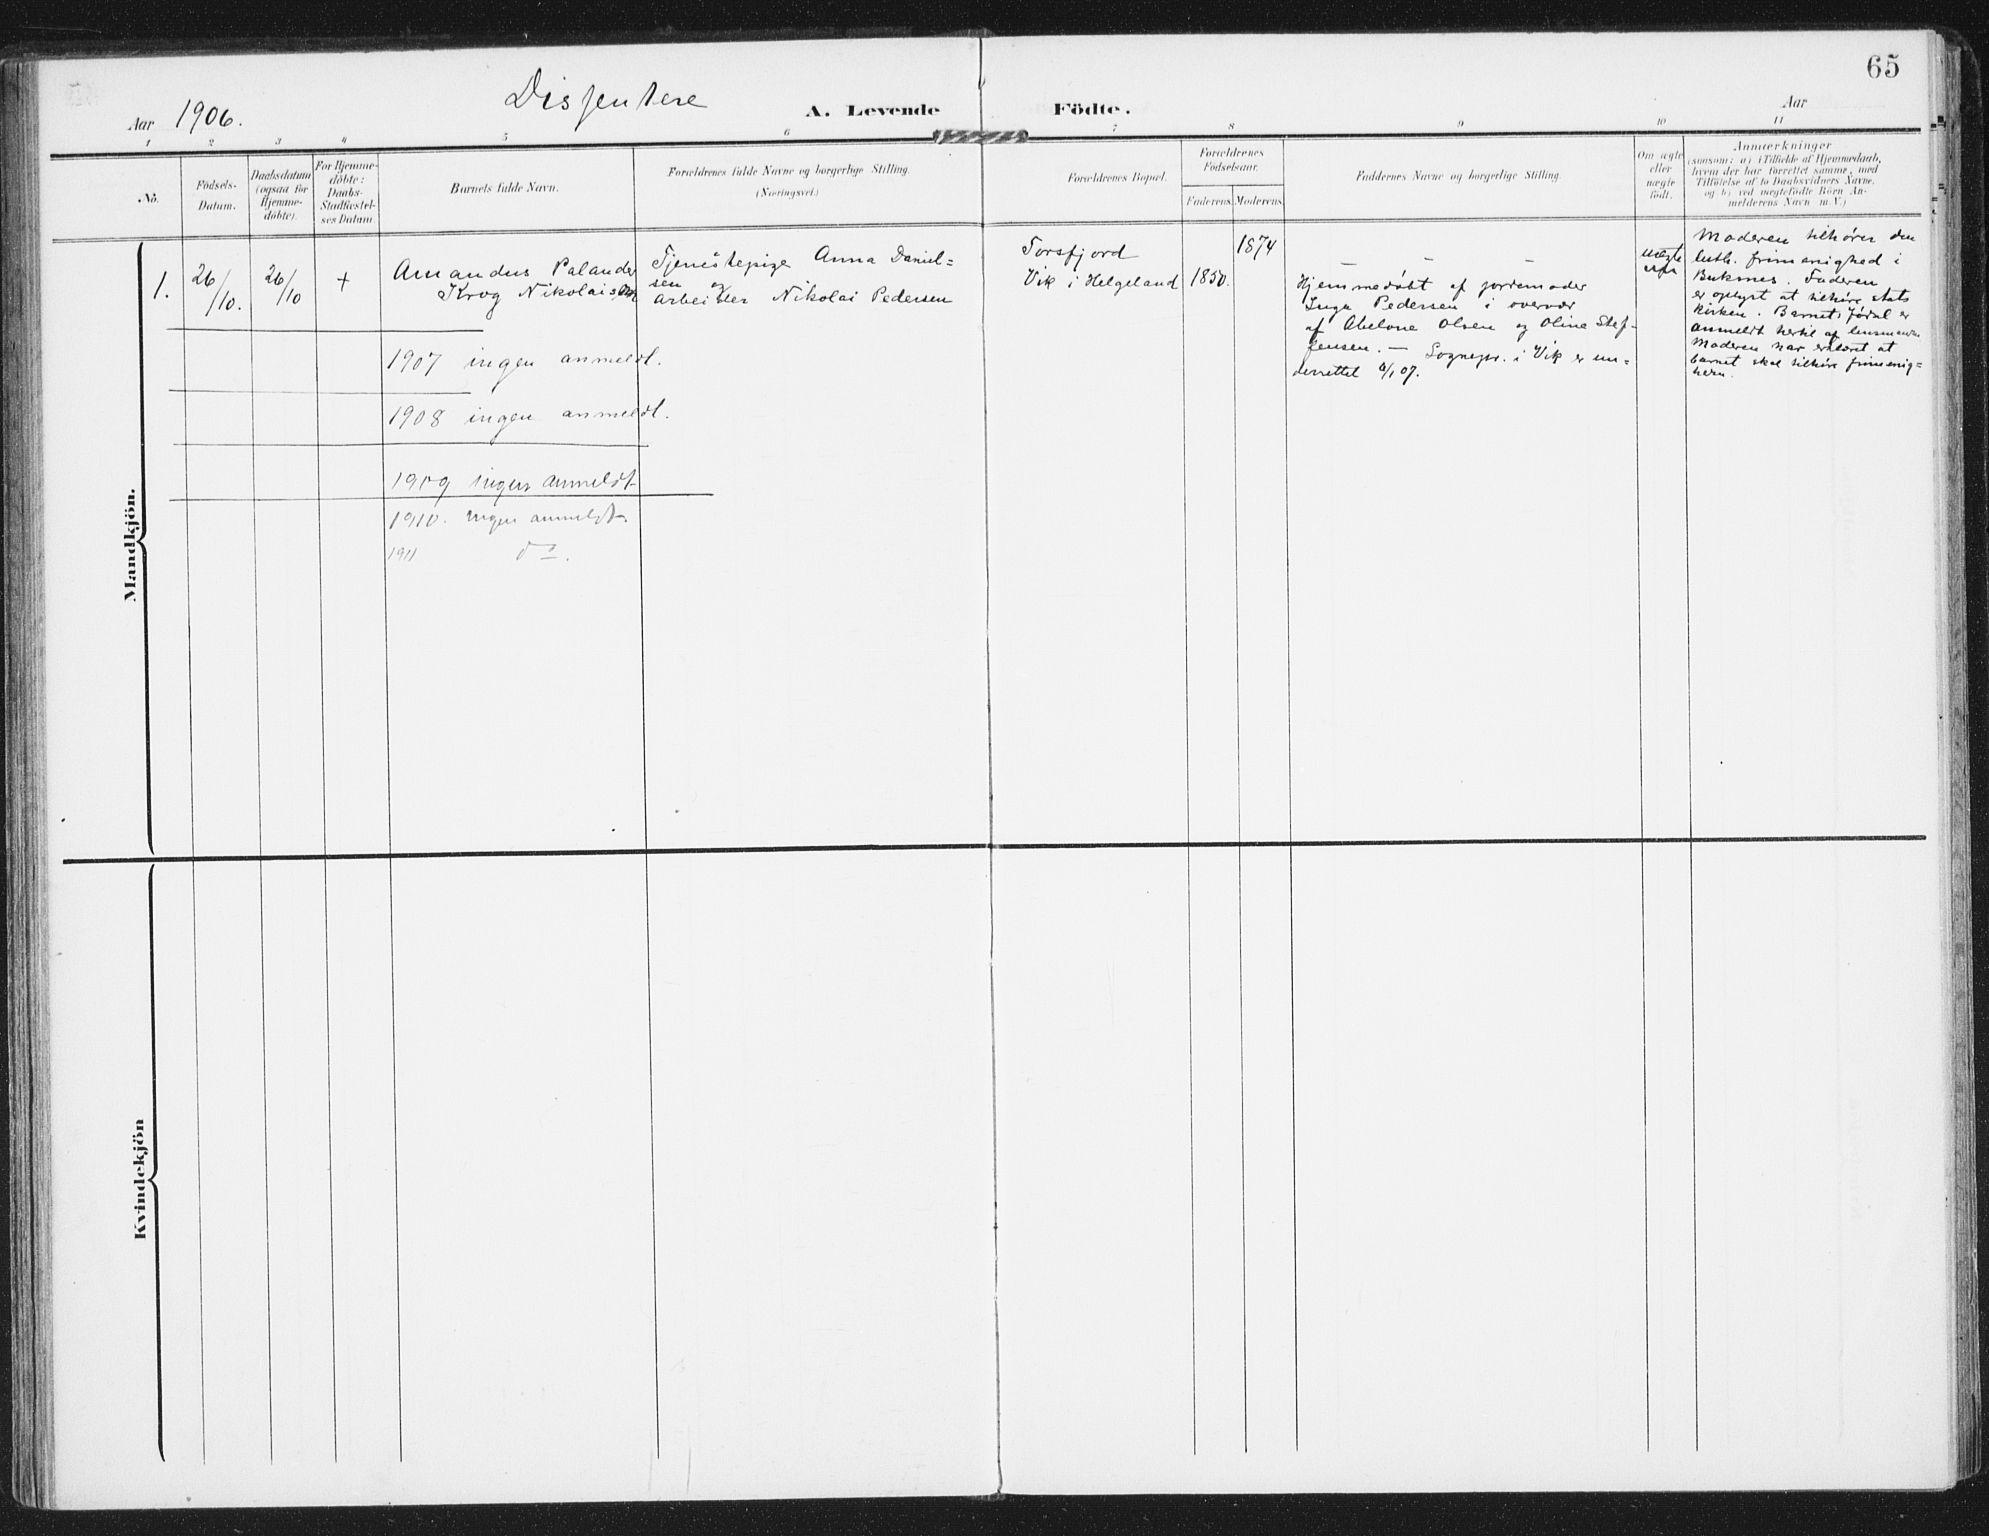 SAT, Ministerialprotokoller, klokkerbøker og fødselsregistre - Nordland, 885/L1206: Ministerialbok nr. 885A07, 1905-1915, s. 65